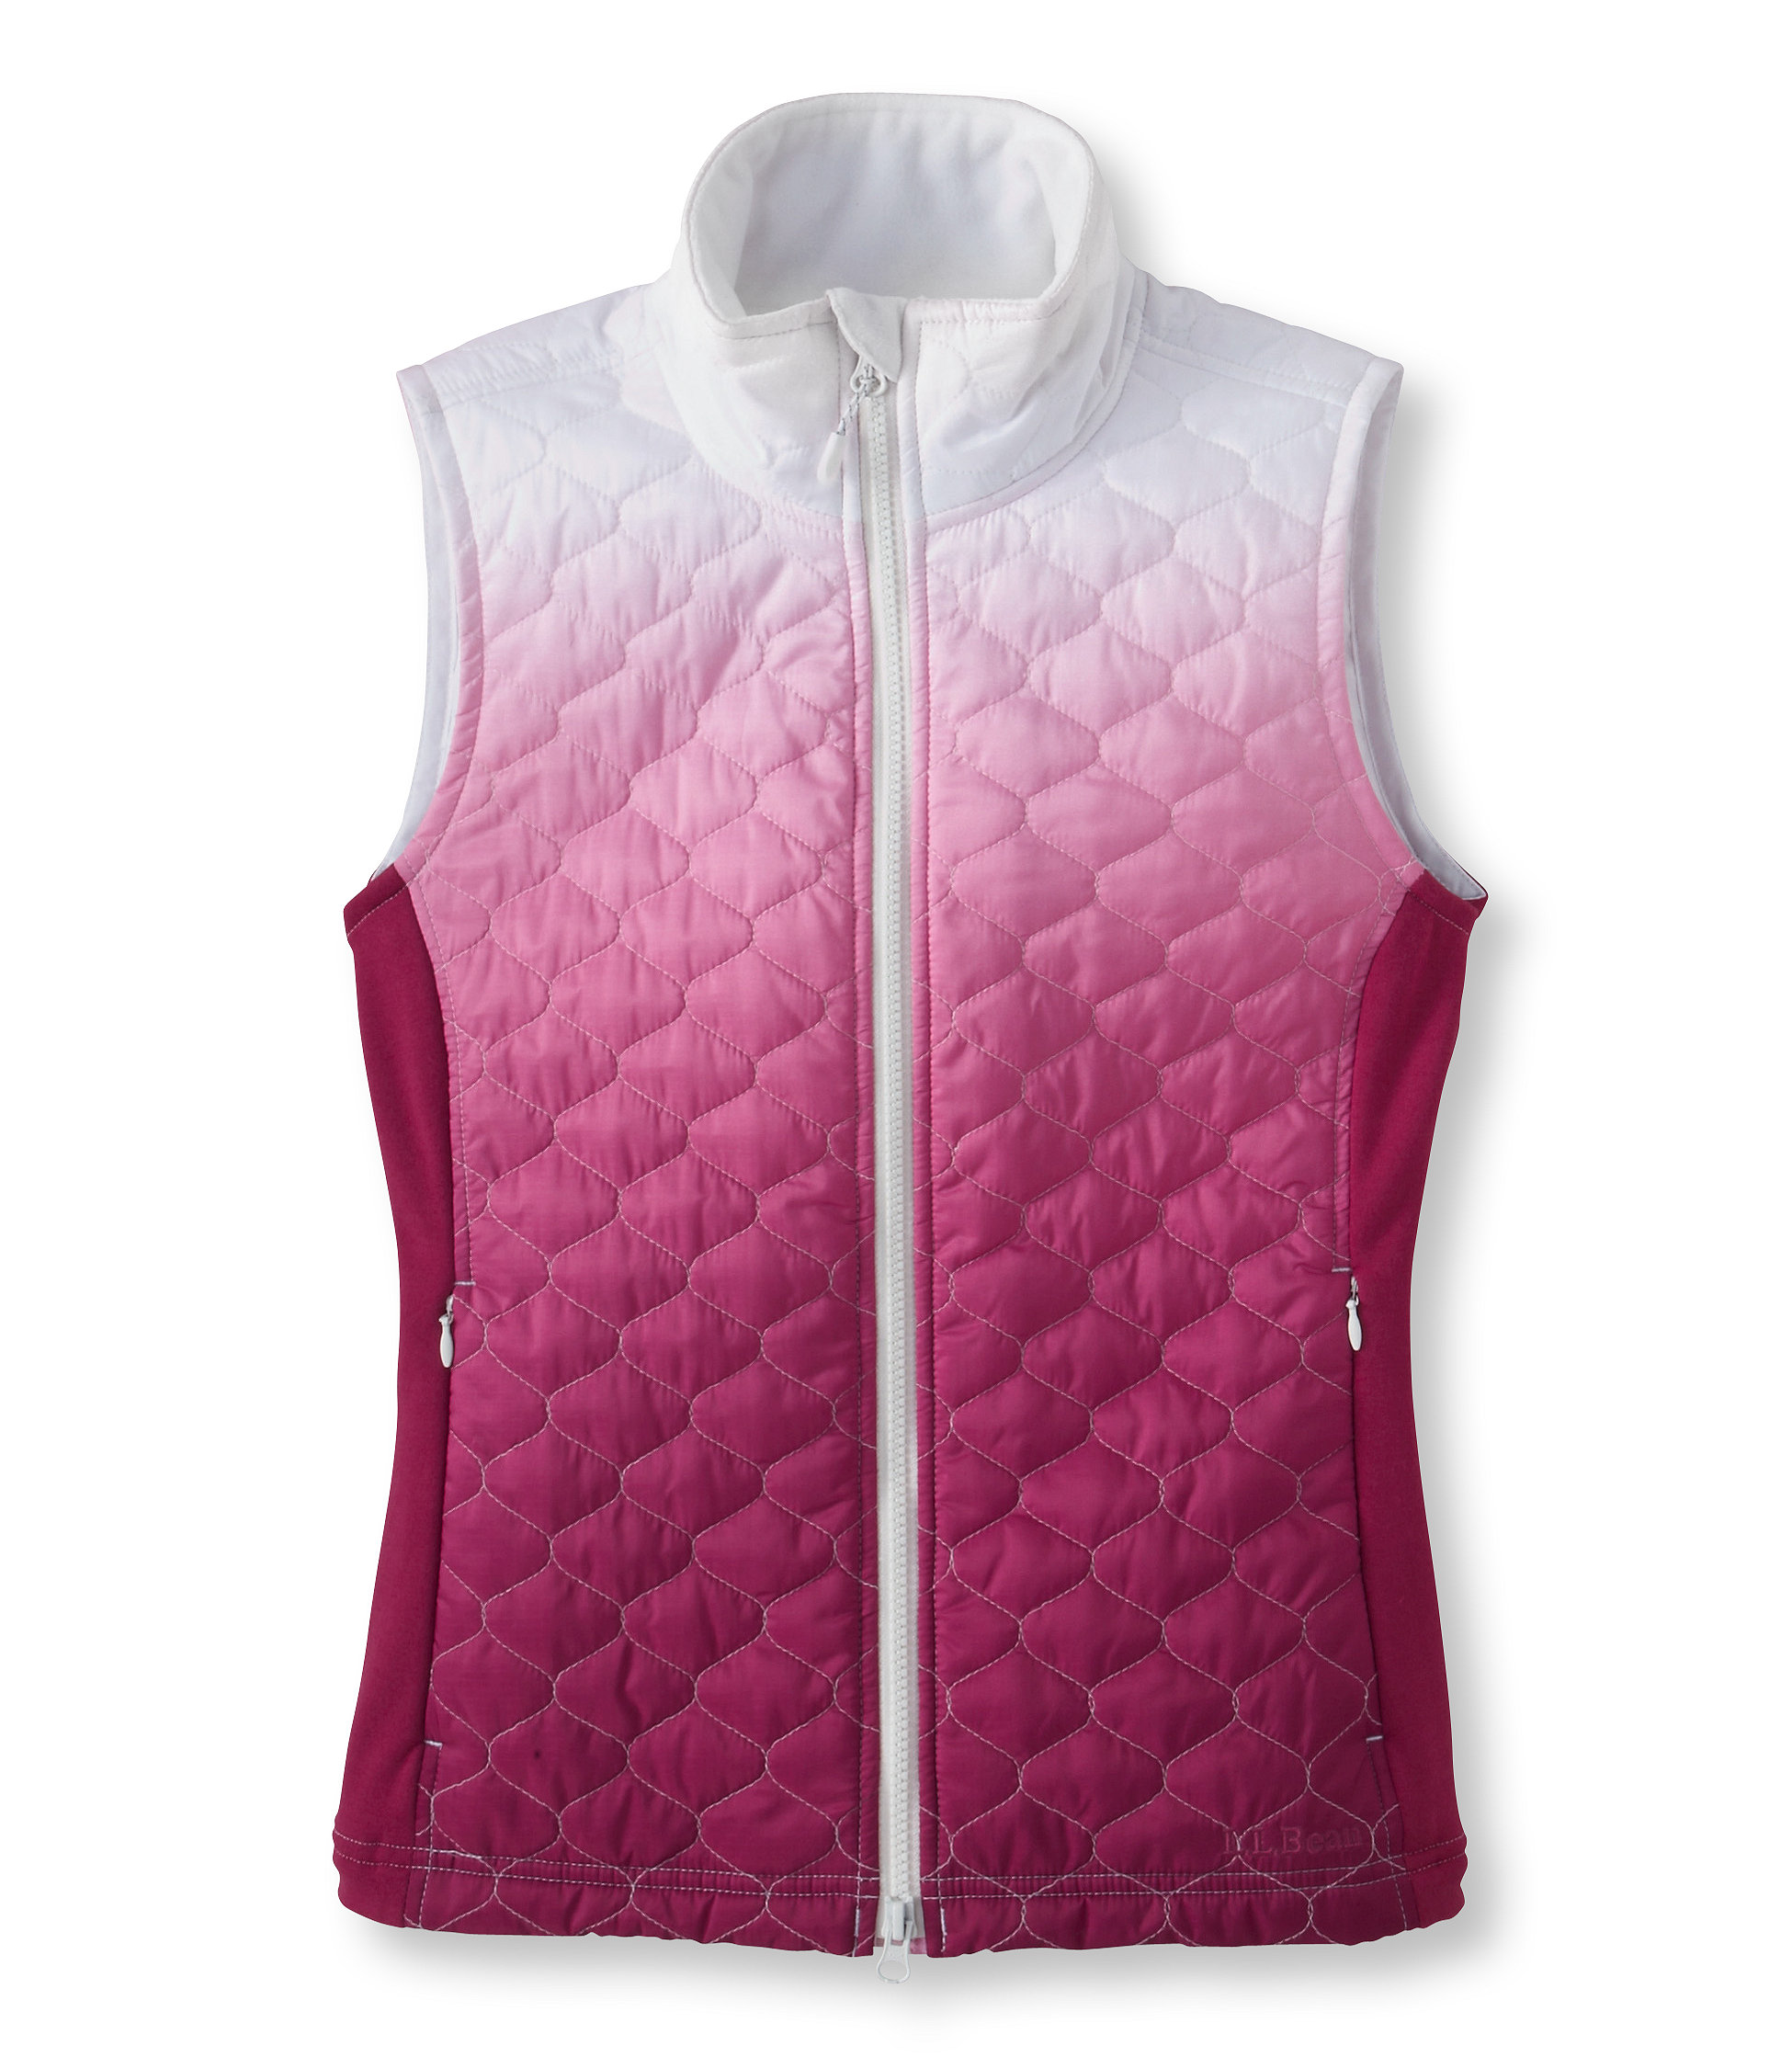 L.L.Bean Thinsulate Fitness Vest